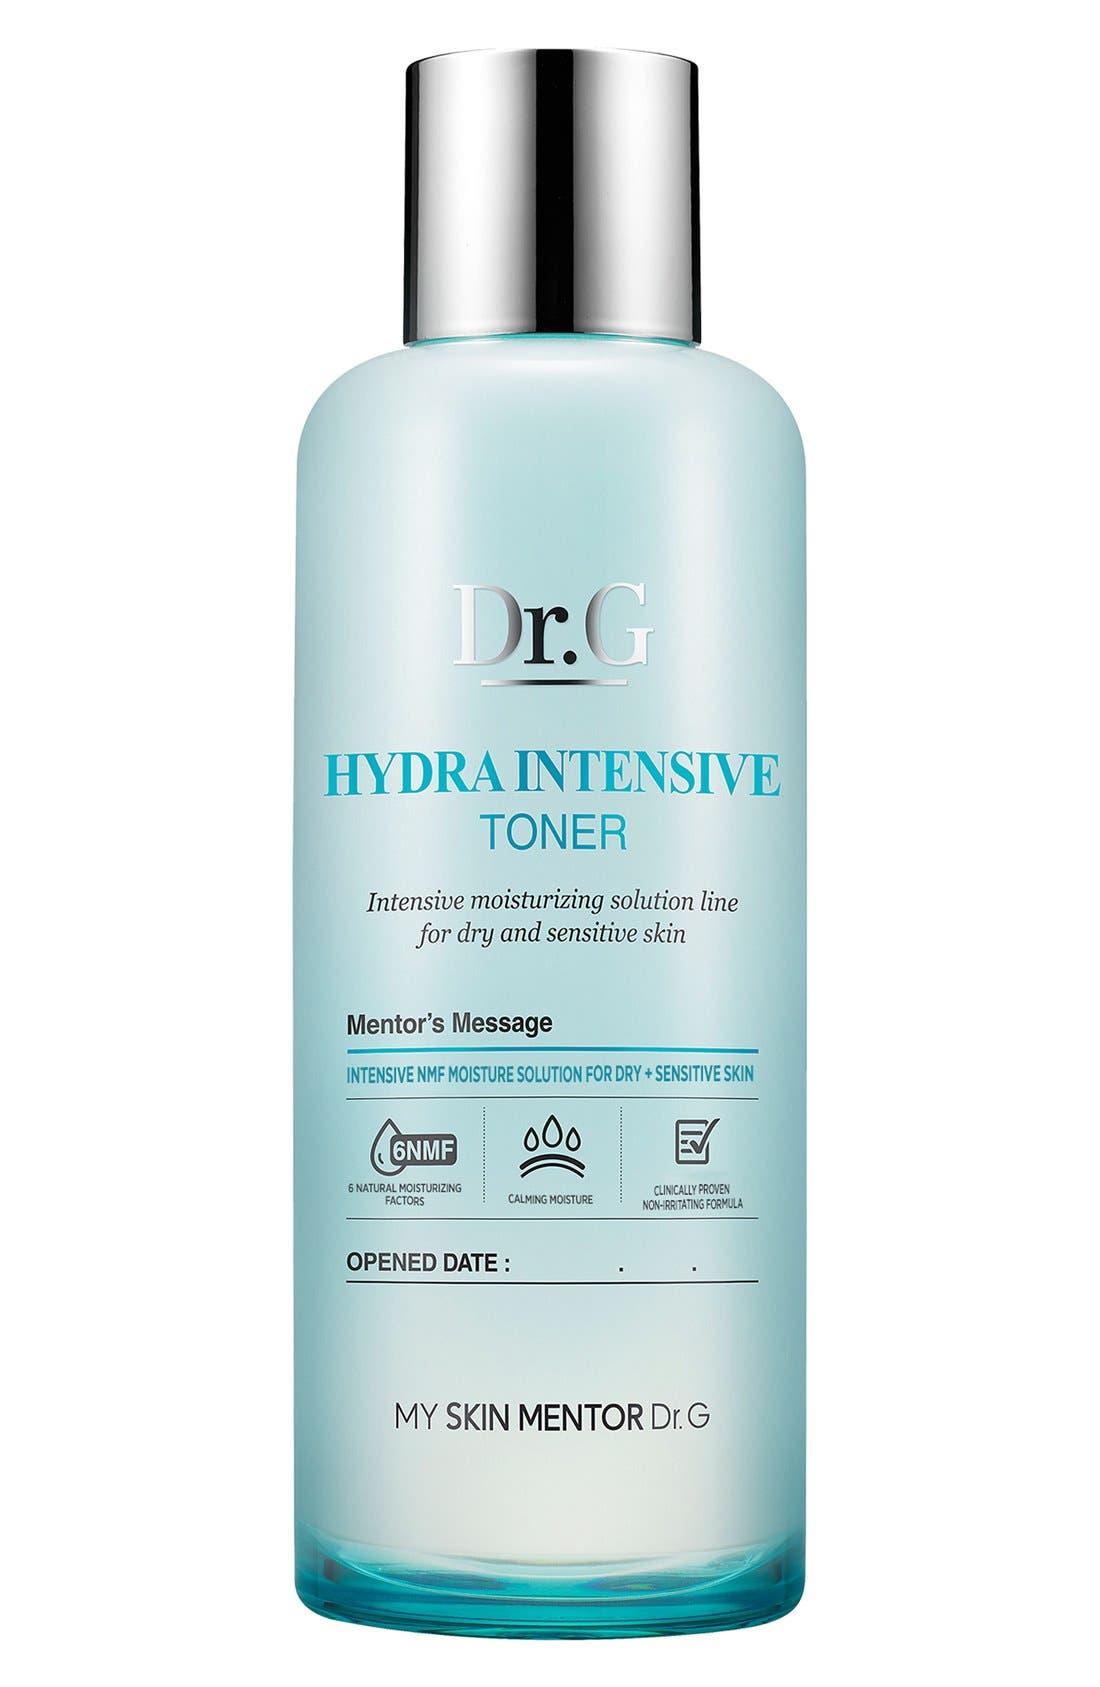 My Skin Mentor Dr. G Beauty Hydra Intensive Toner